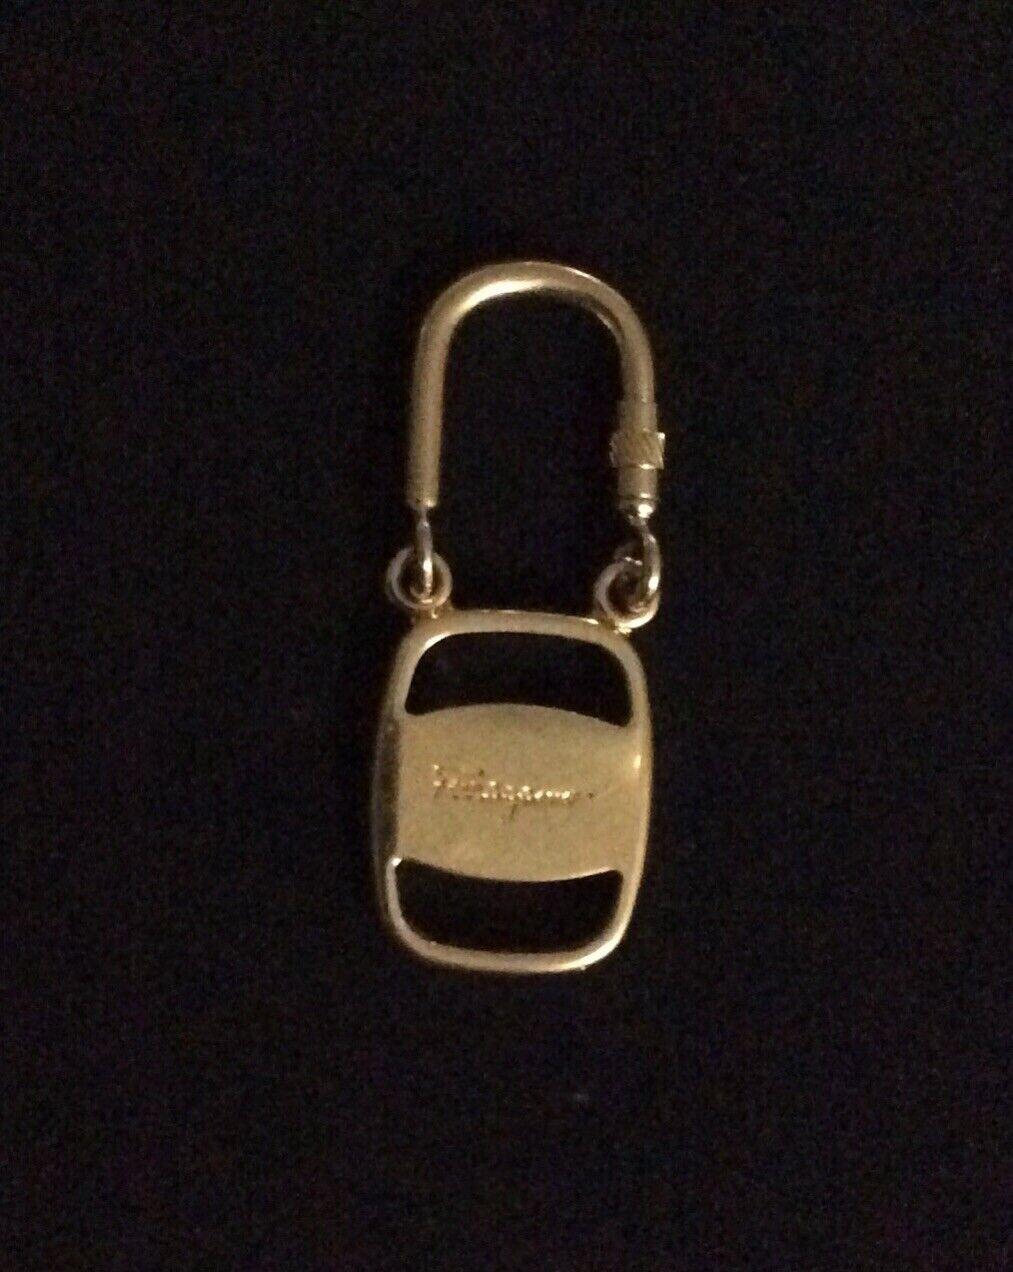 Authentic Salvatore Ferragamo Keychain Gold Tone. Made In Italy.